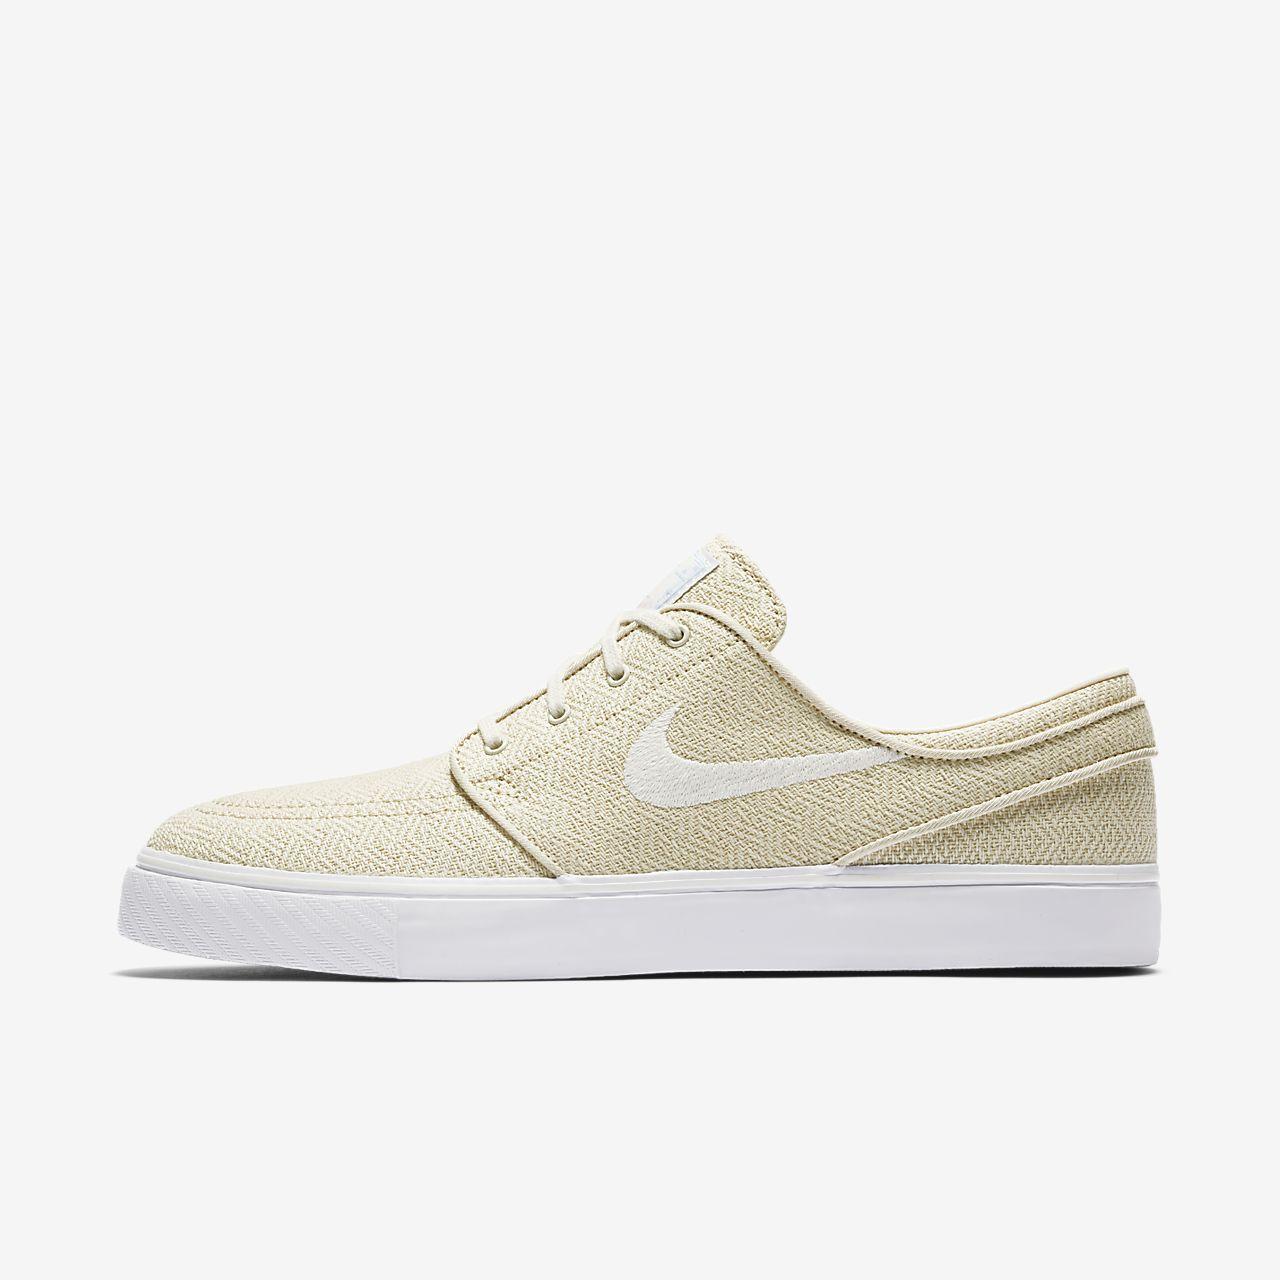 ... Nike SB Zoom Stefan Janoski Canvas Skateschoen voor heren